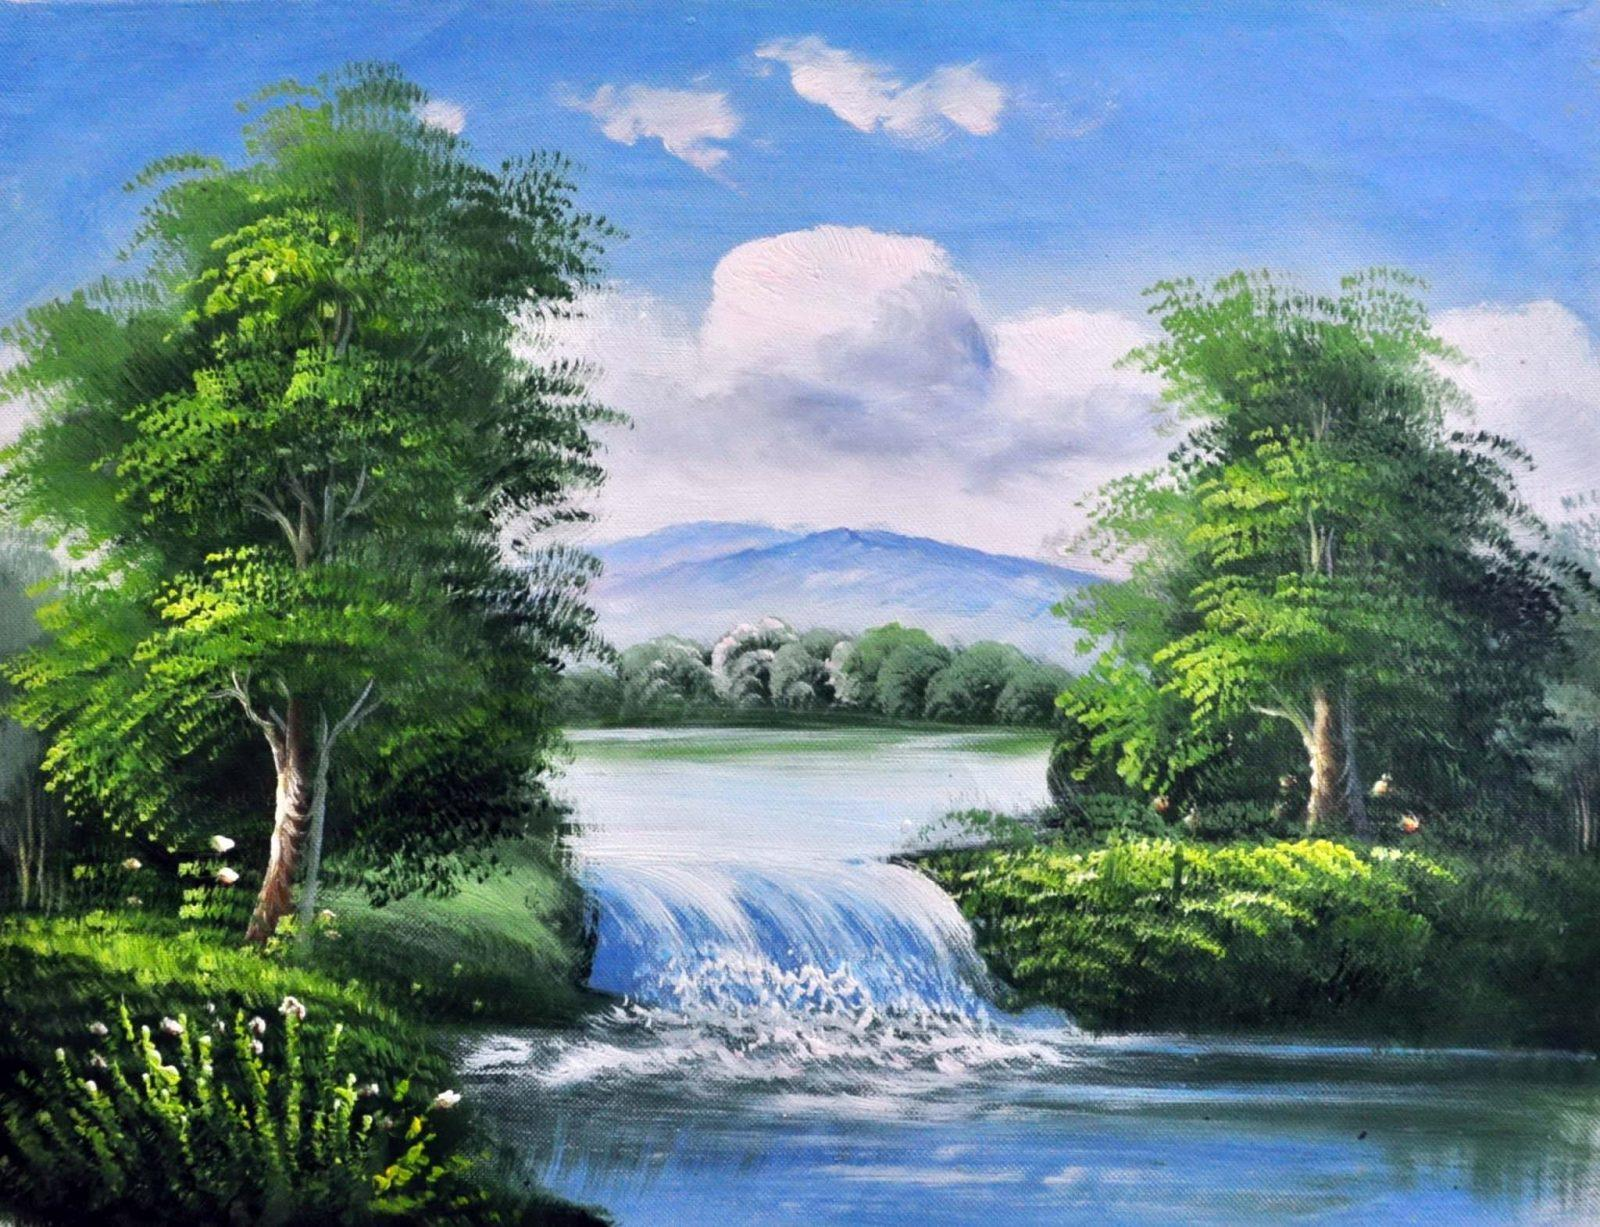 «Пейзаж с водопадом» картина 30х40 3п010